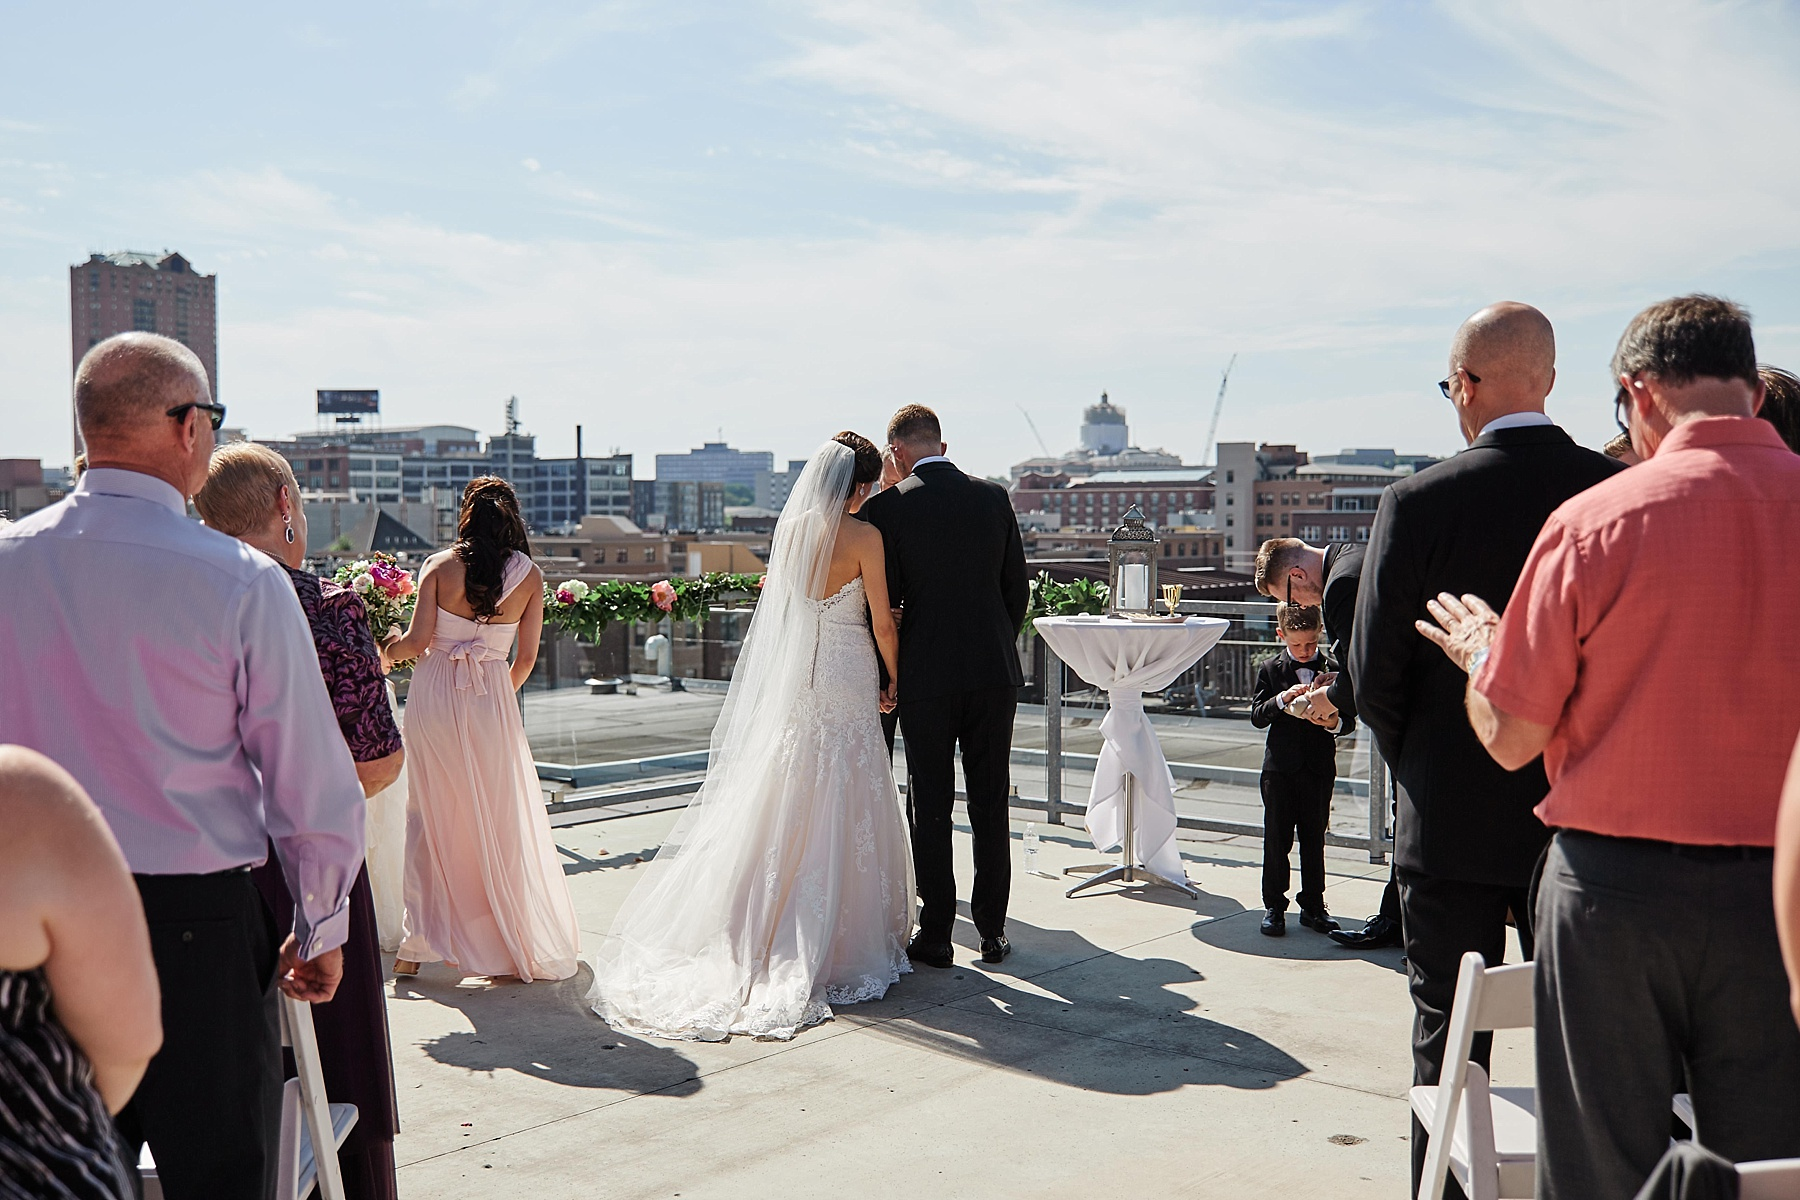 ABULAE-Wedding-Saint-paul-MN-Josh-Sofia-Wedding-Mears-Park_0759.jpg